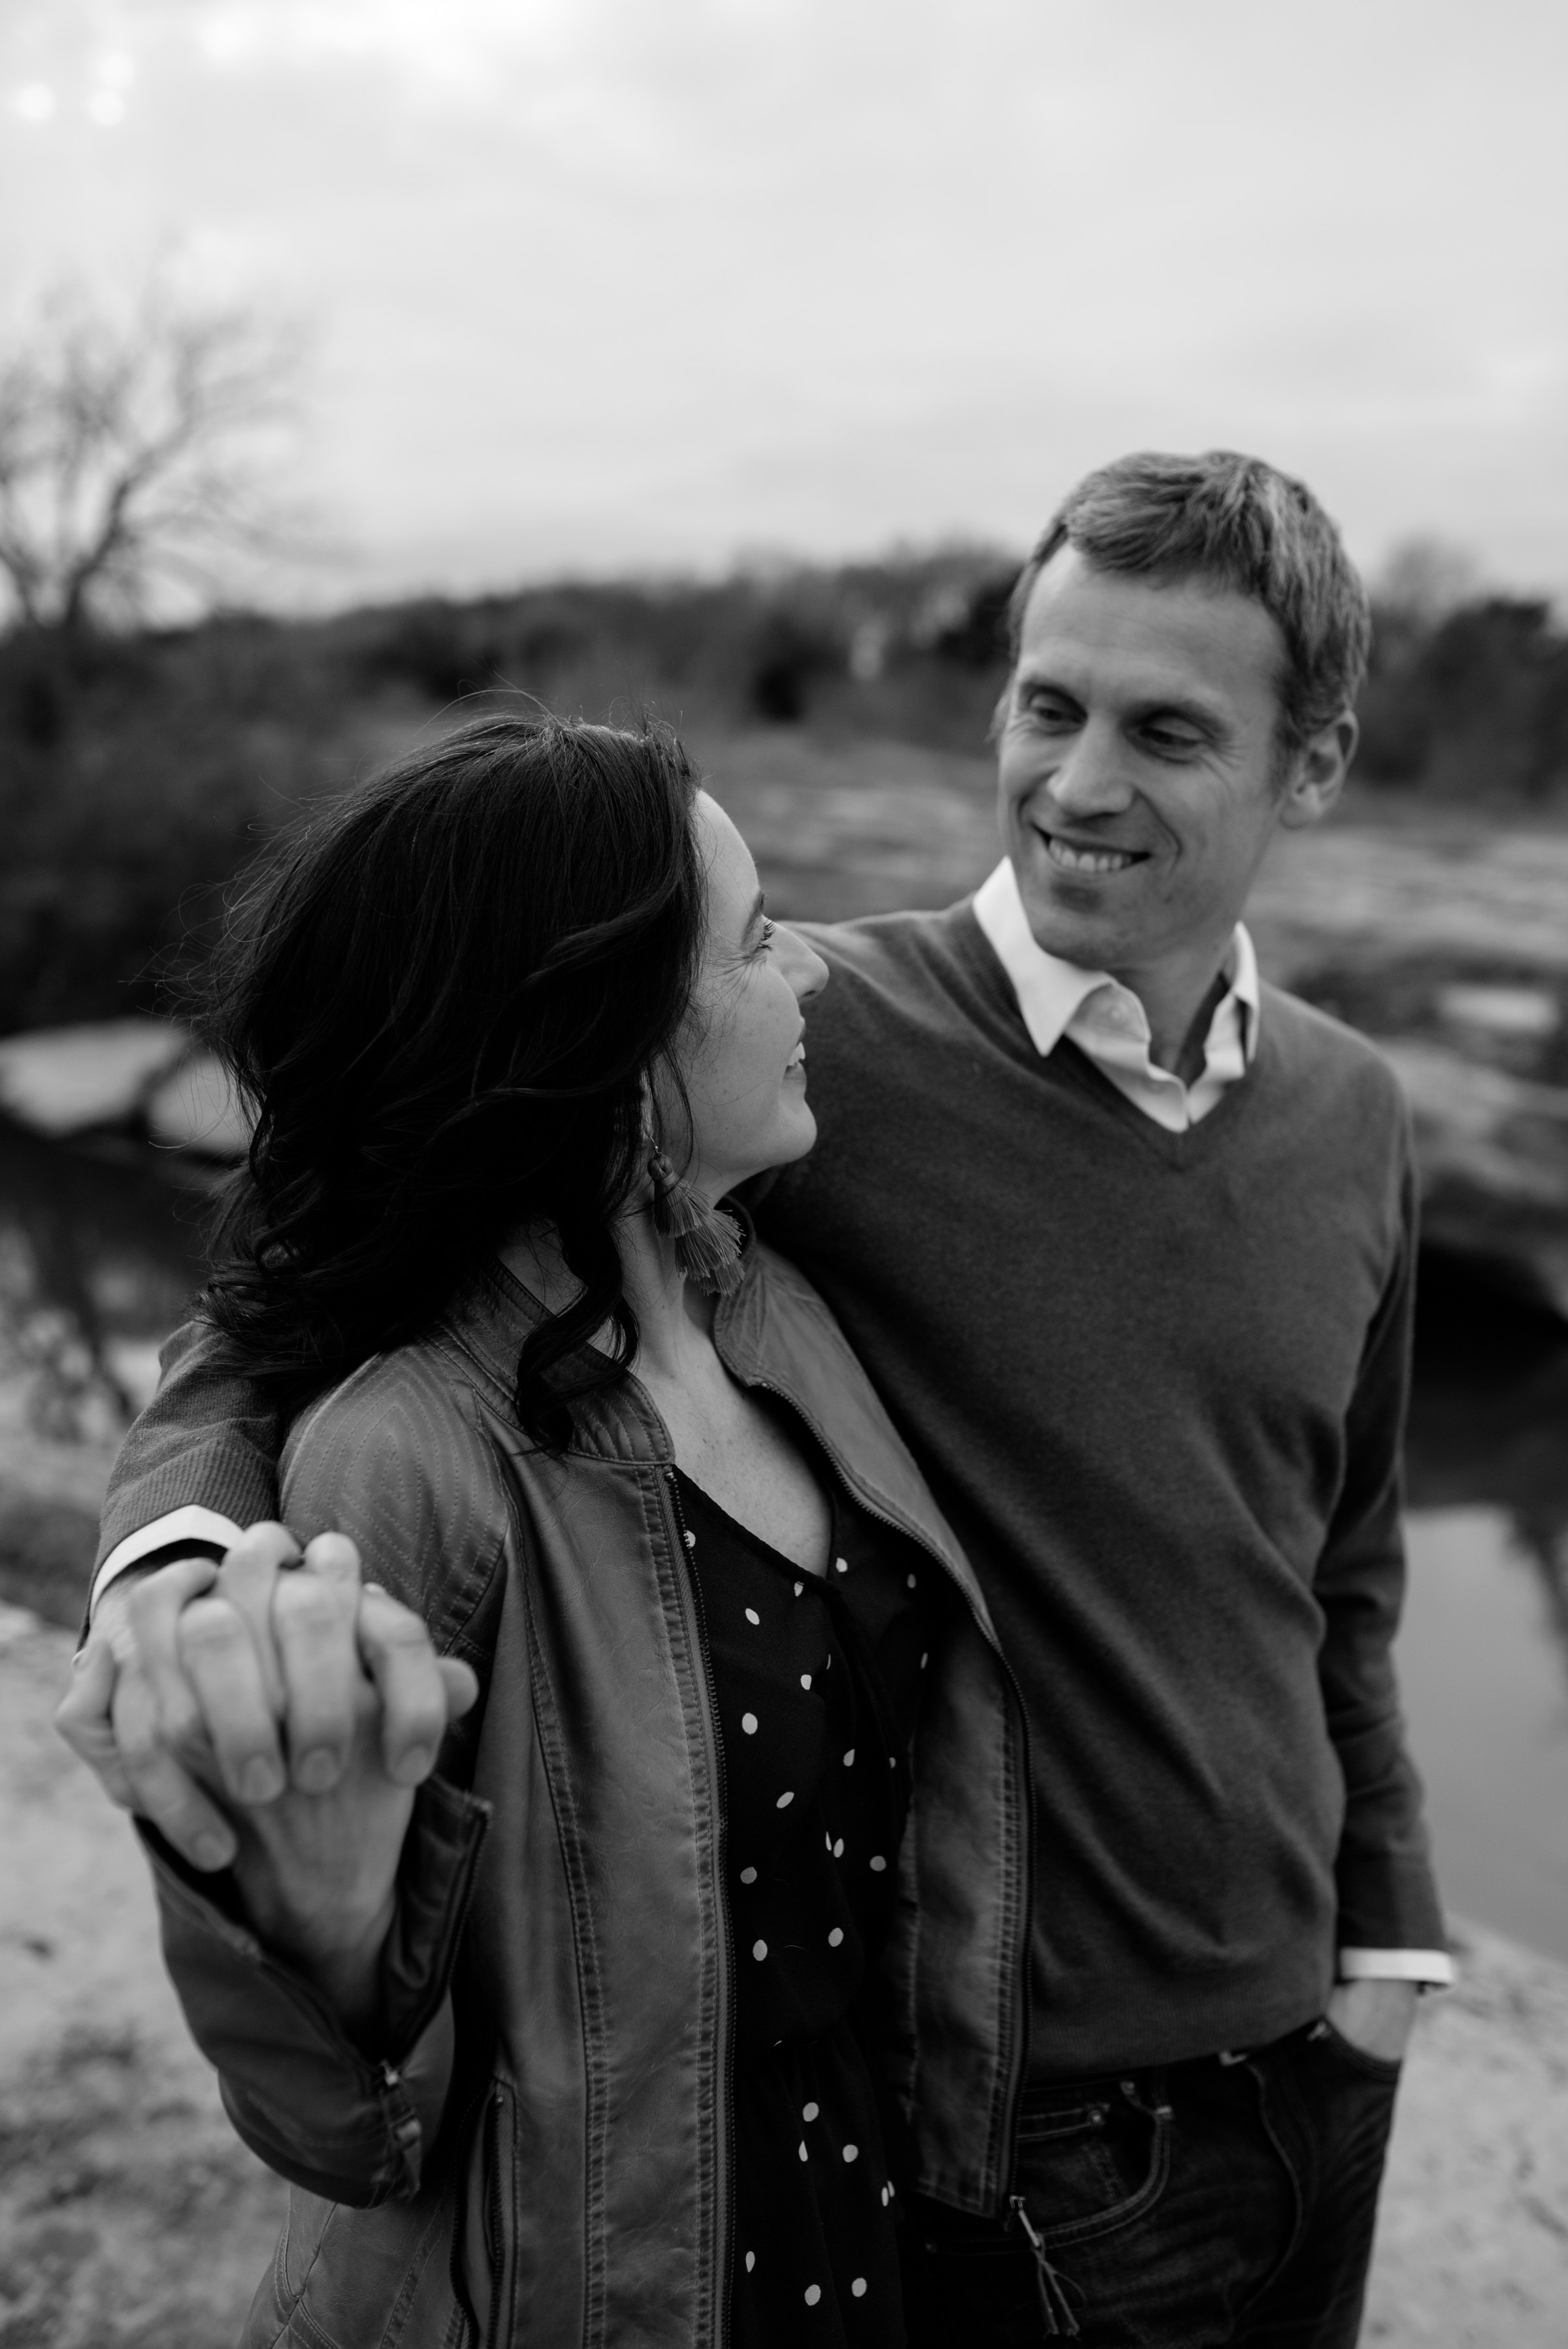 austin-mckinney-falls-engagement-photographer-elopement-prices-best-headshot-senior-adventurous-italy-minneapolis-texas-minnesota-dallas-houston-tulum-mexico_0033.jpg